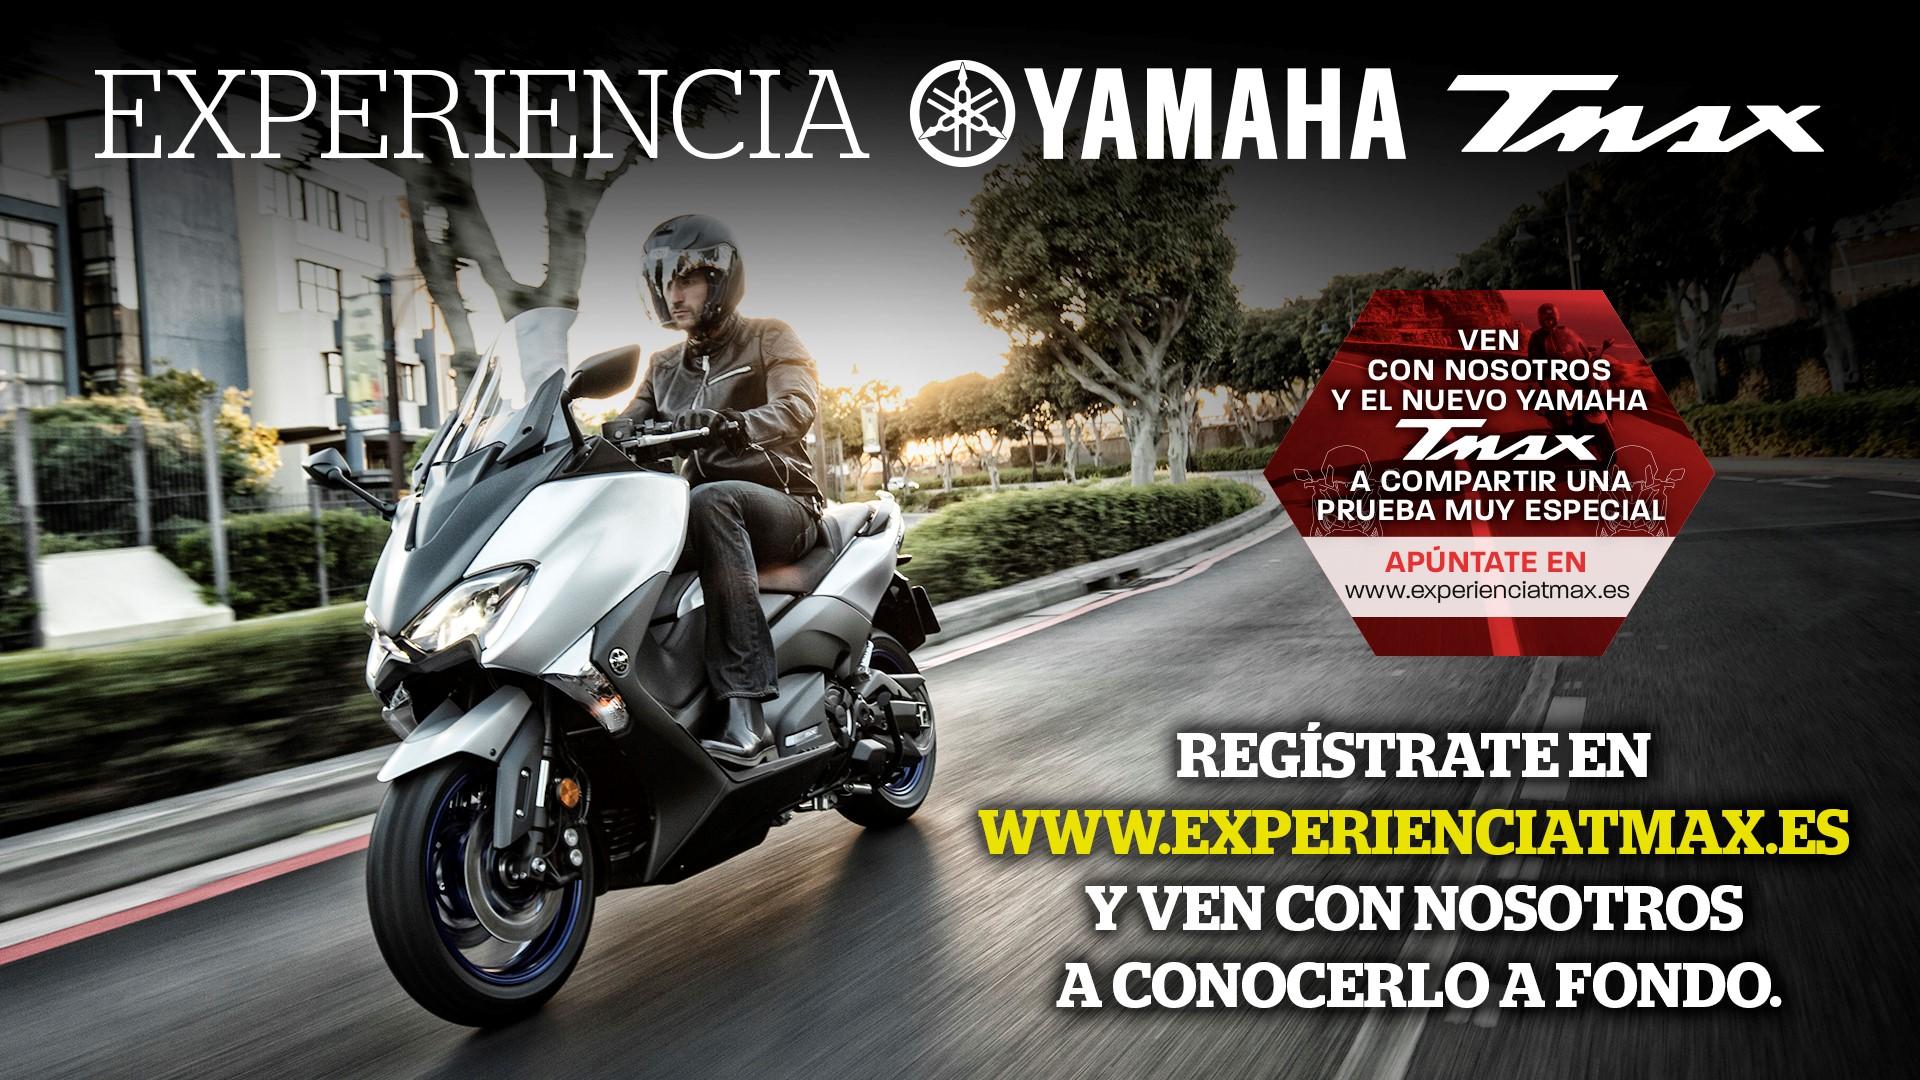 La Experiencia Yamaha TMAX ¡te espera!